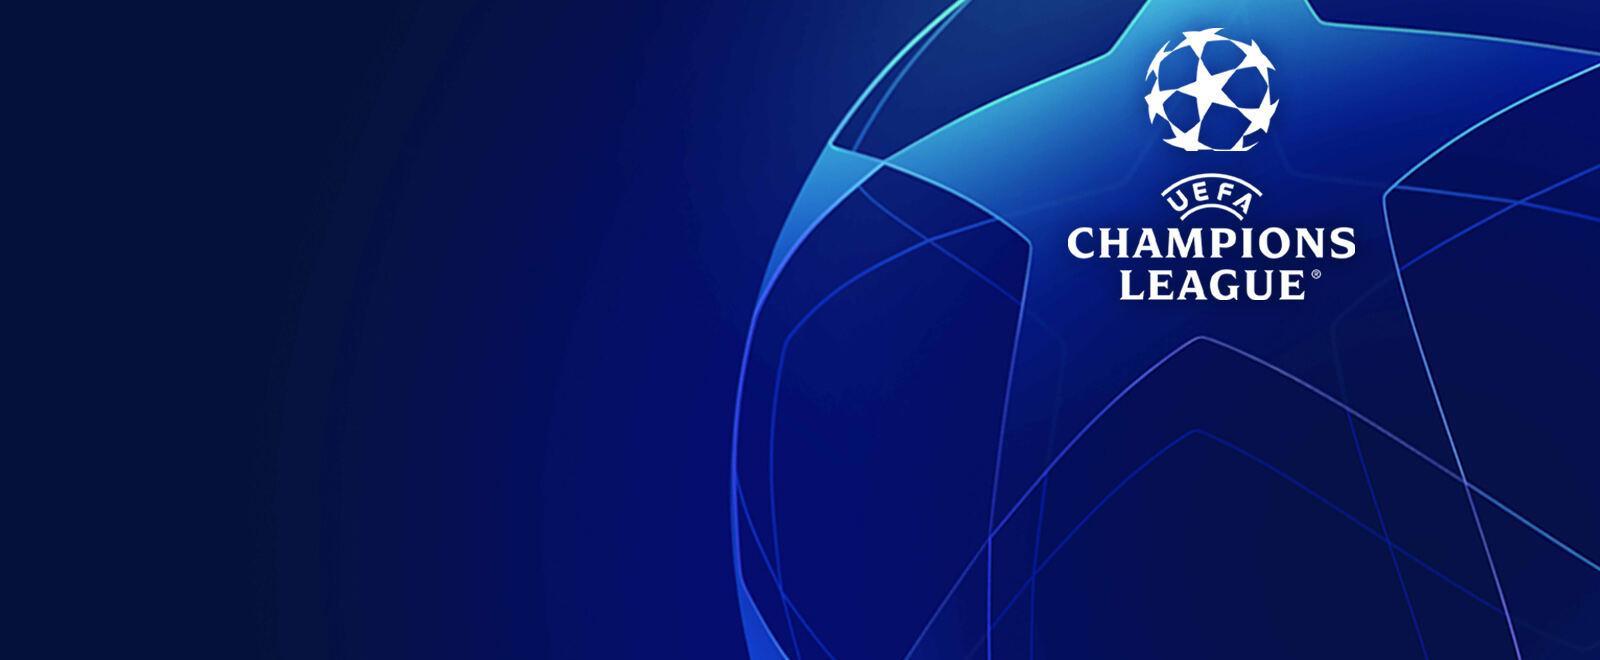 Magazine champions league